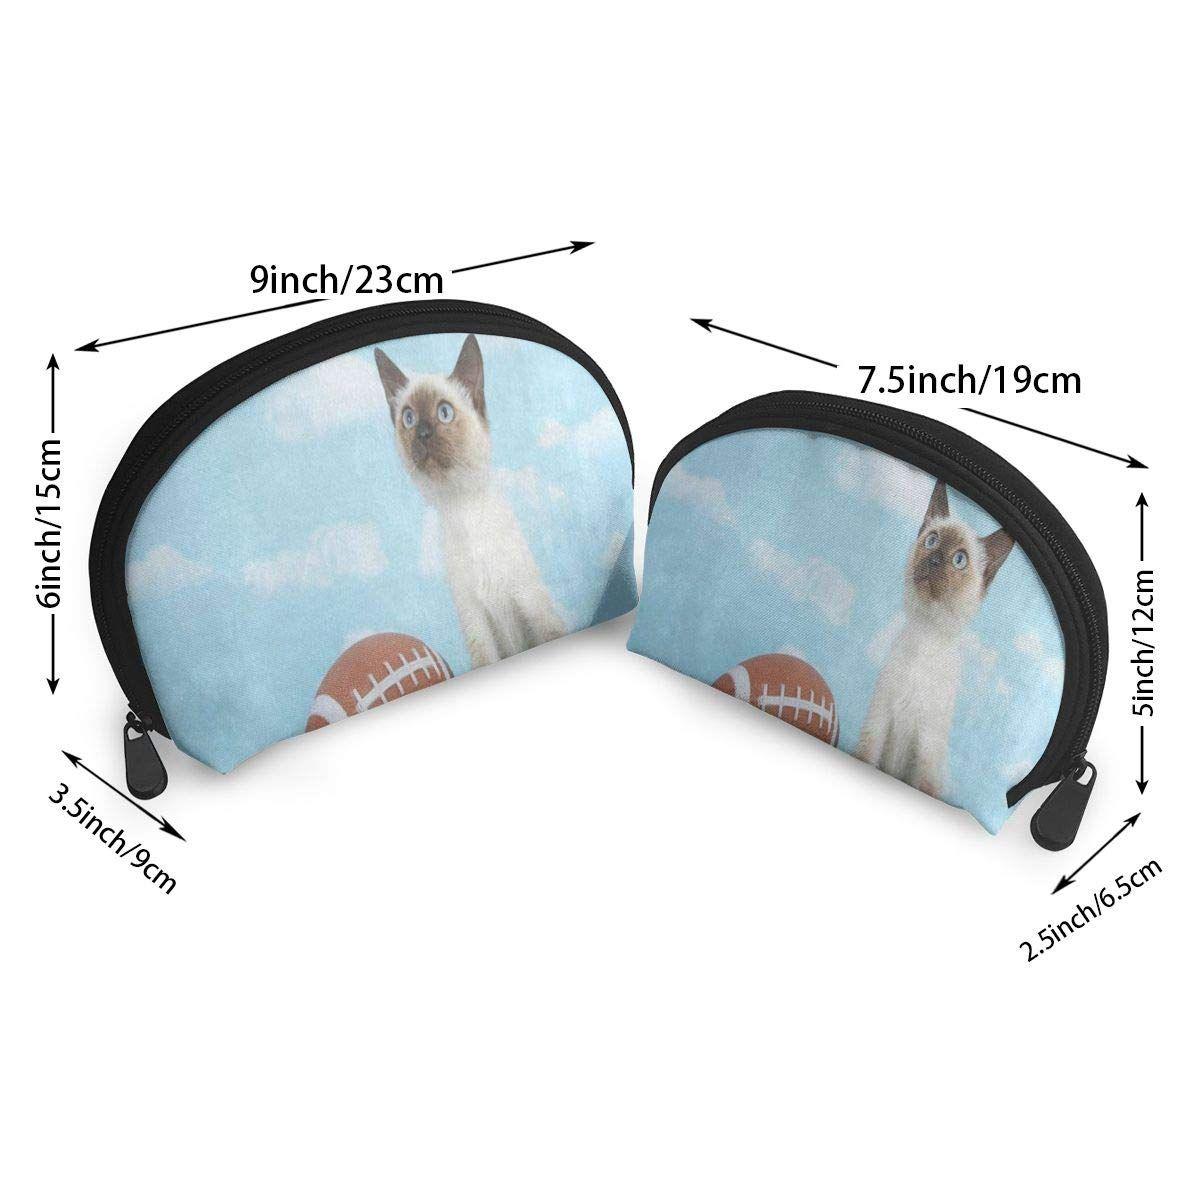 679ce91fa6 Makeup Bag Hipster Cat Kitten Green Grass Football Handy Shell Toiletry  Bags Storage For Women